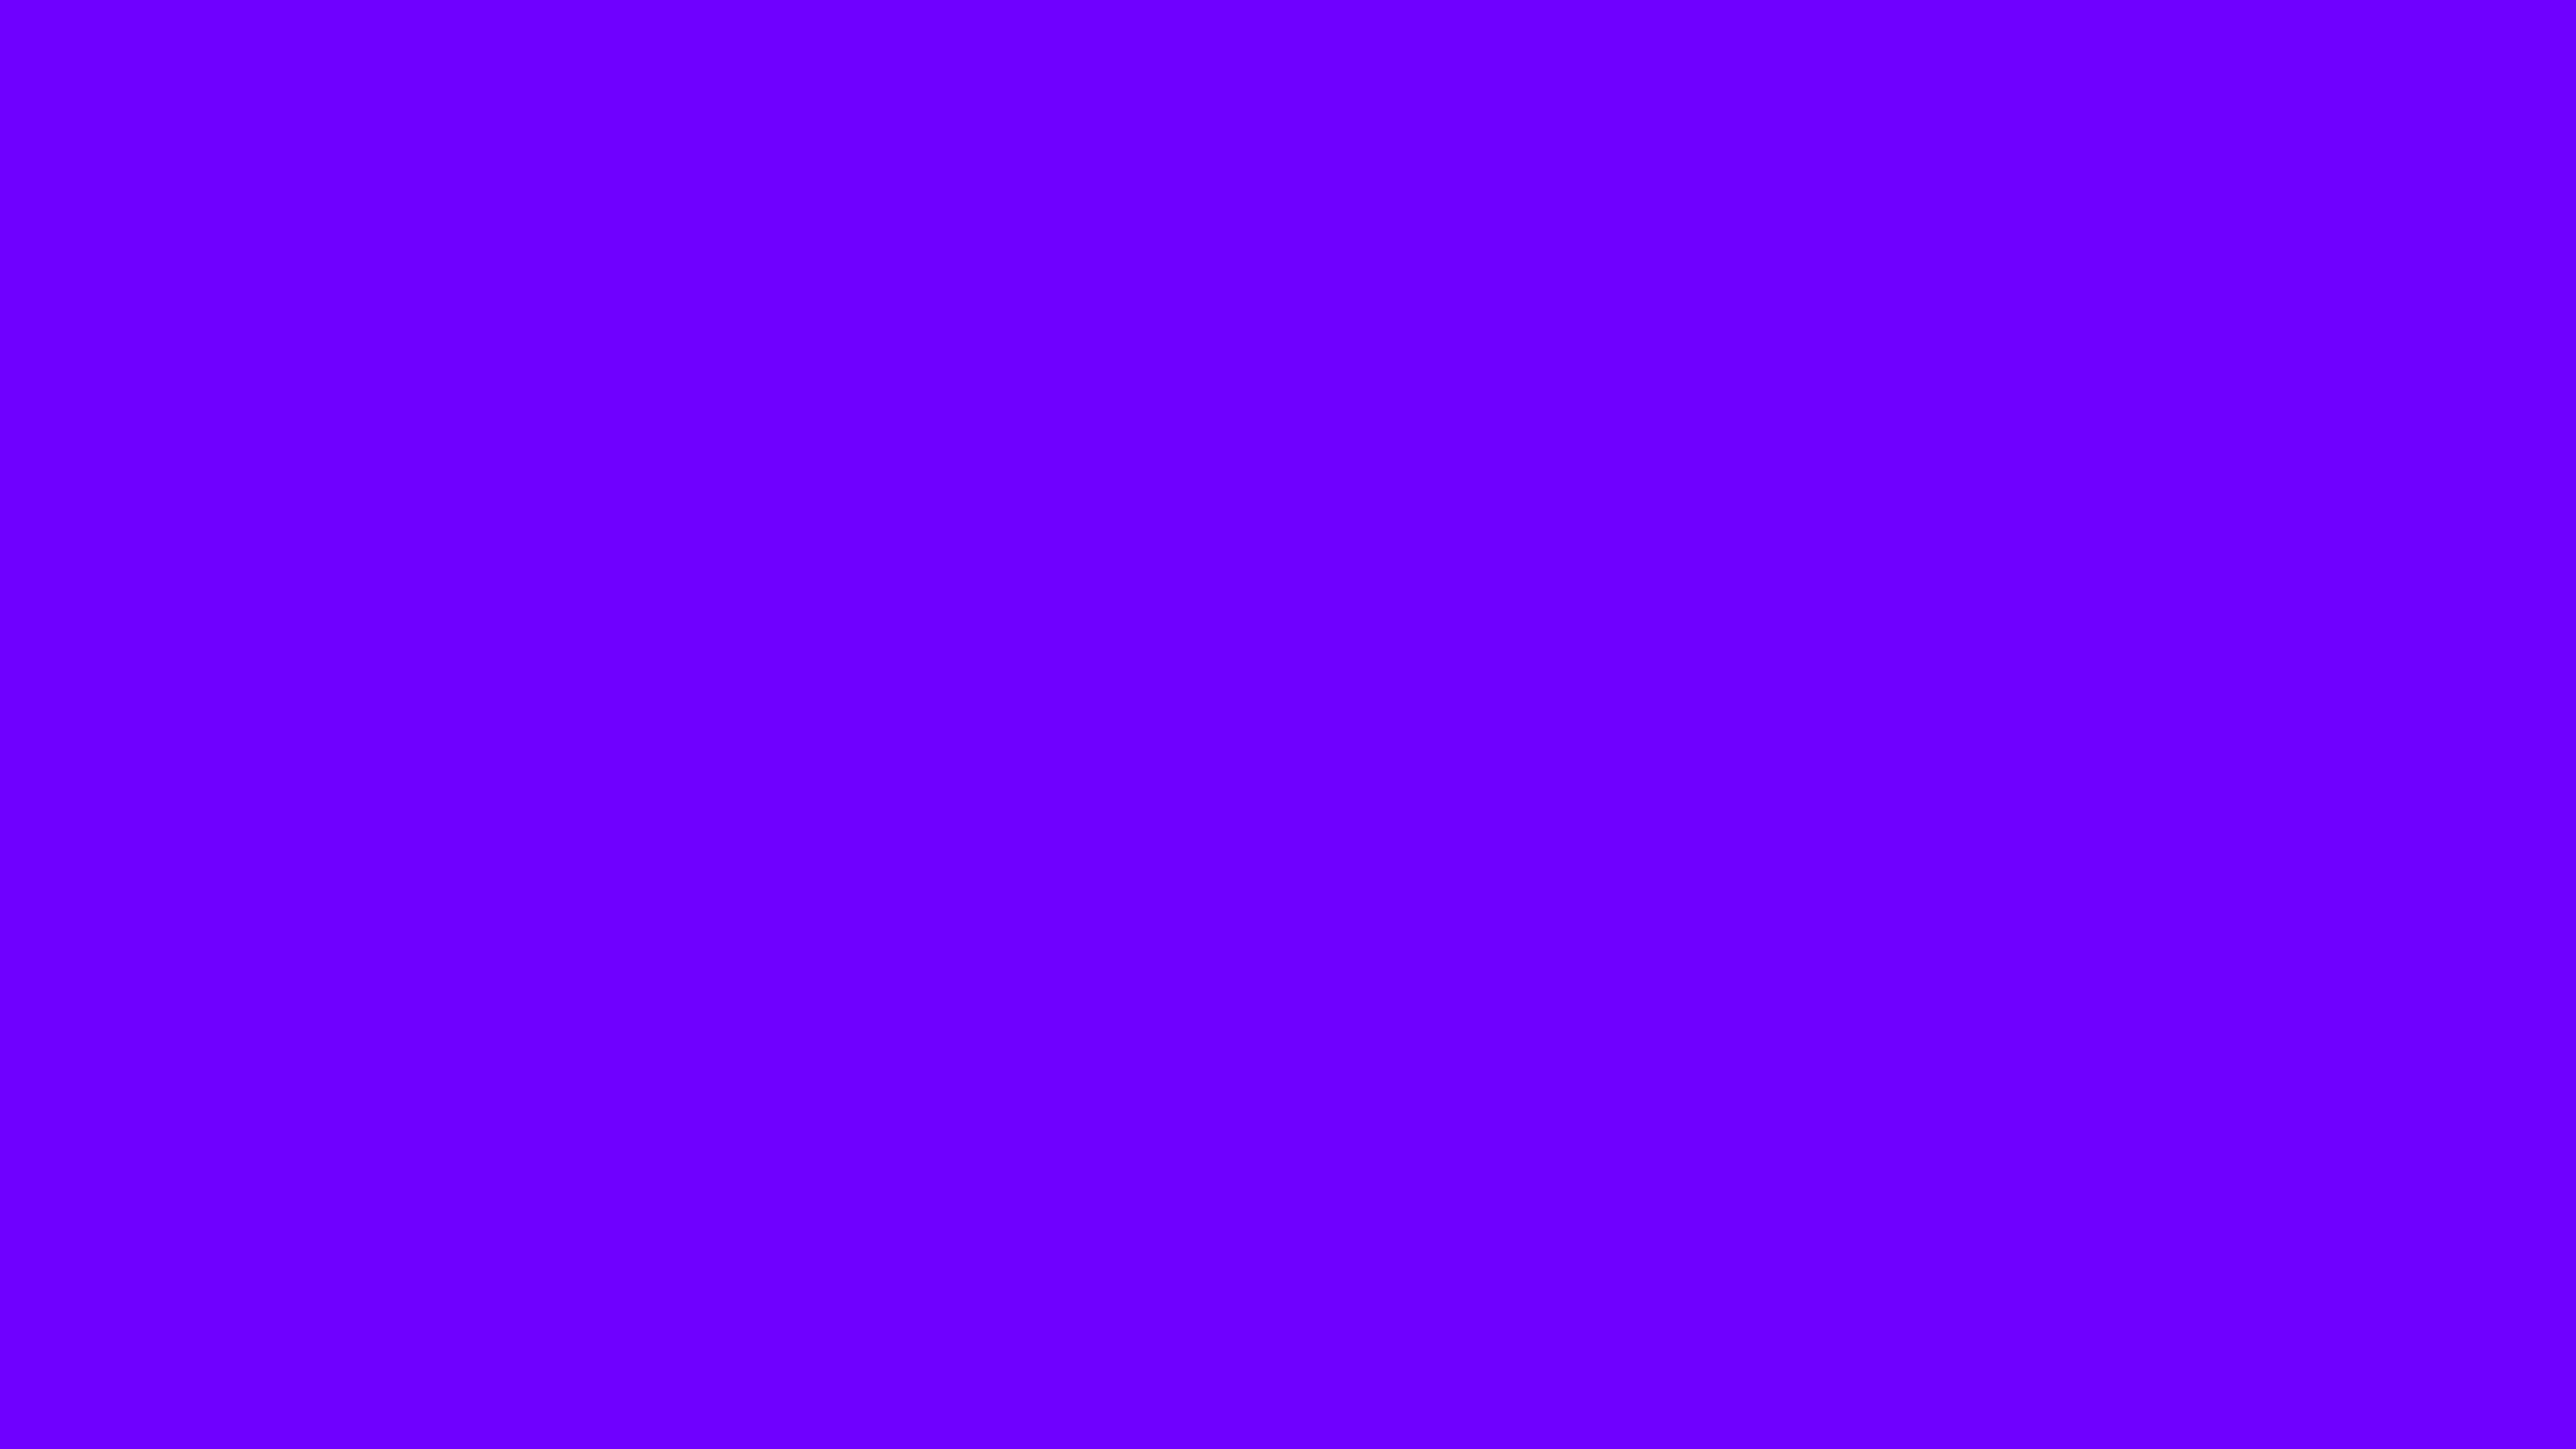 5120x2880 Electric Indigo Solid Color Background